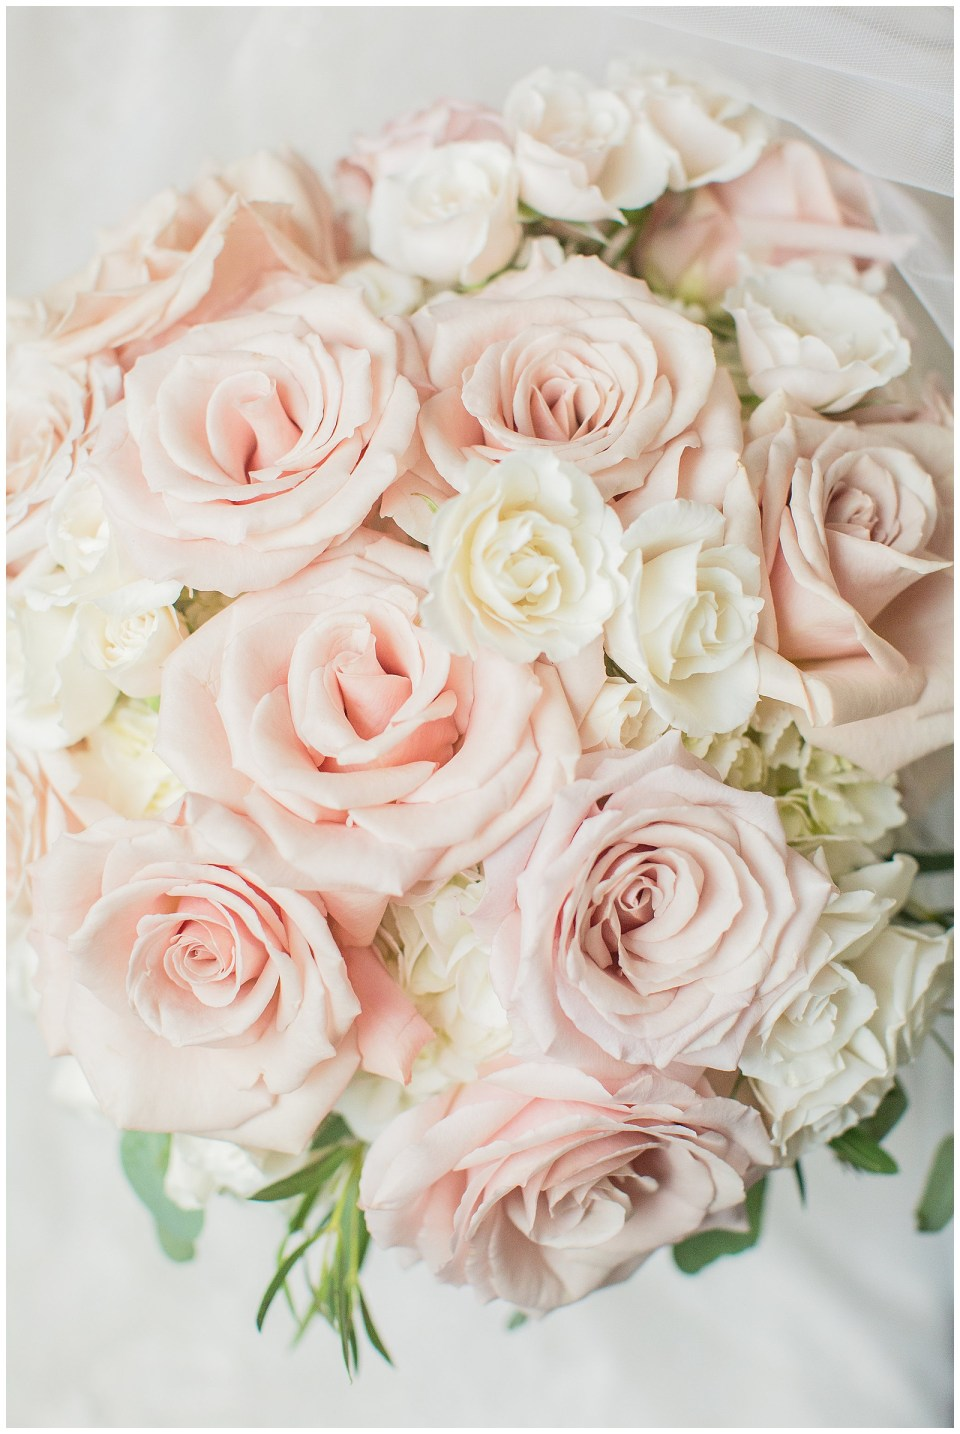 Blush and Cream Bridal Bouquet